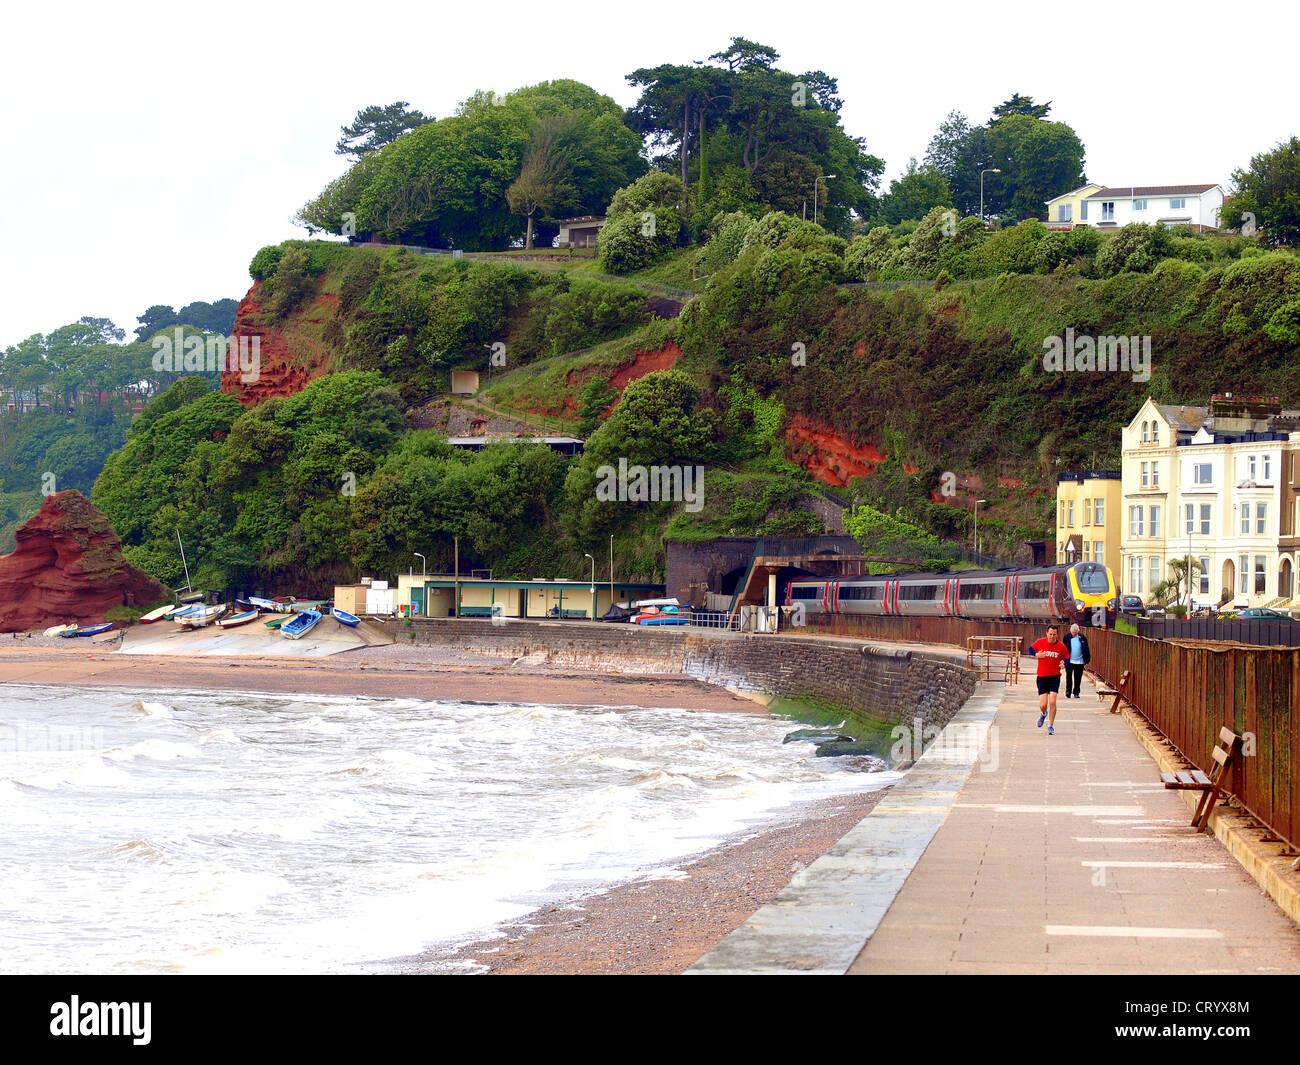 Coast at Dawlish, South Devon - Stock Image